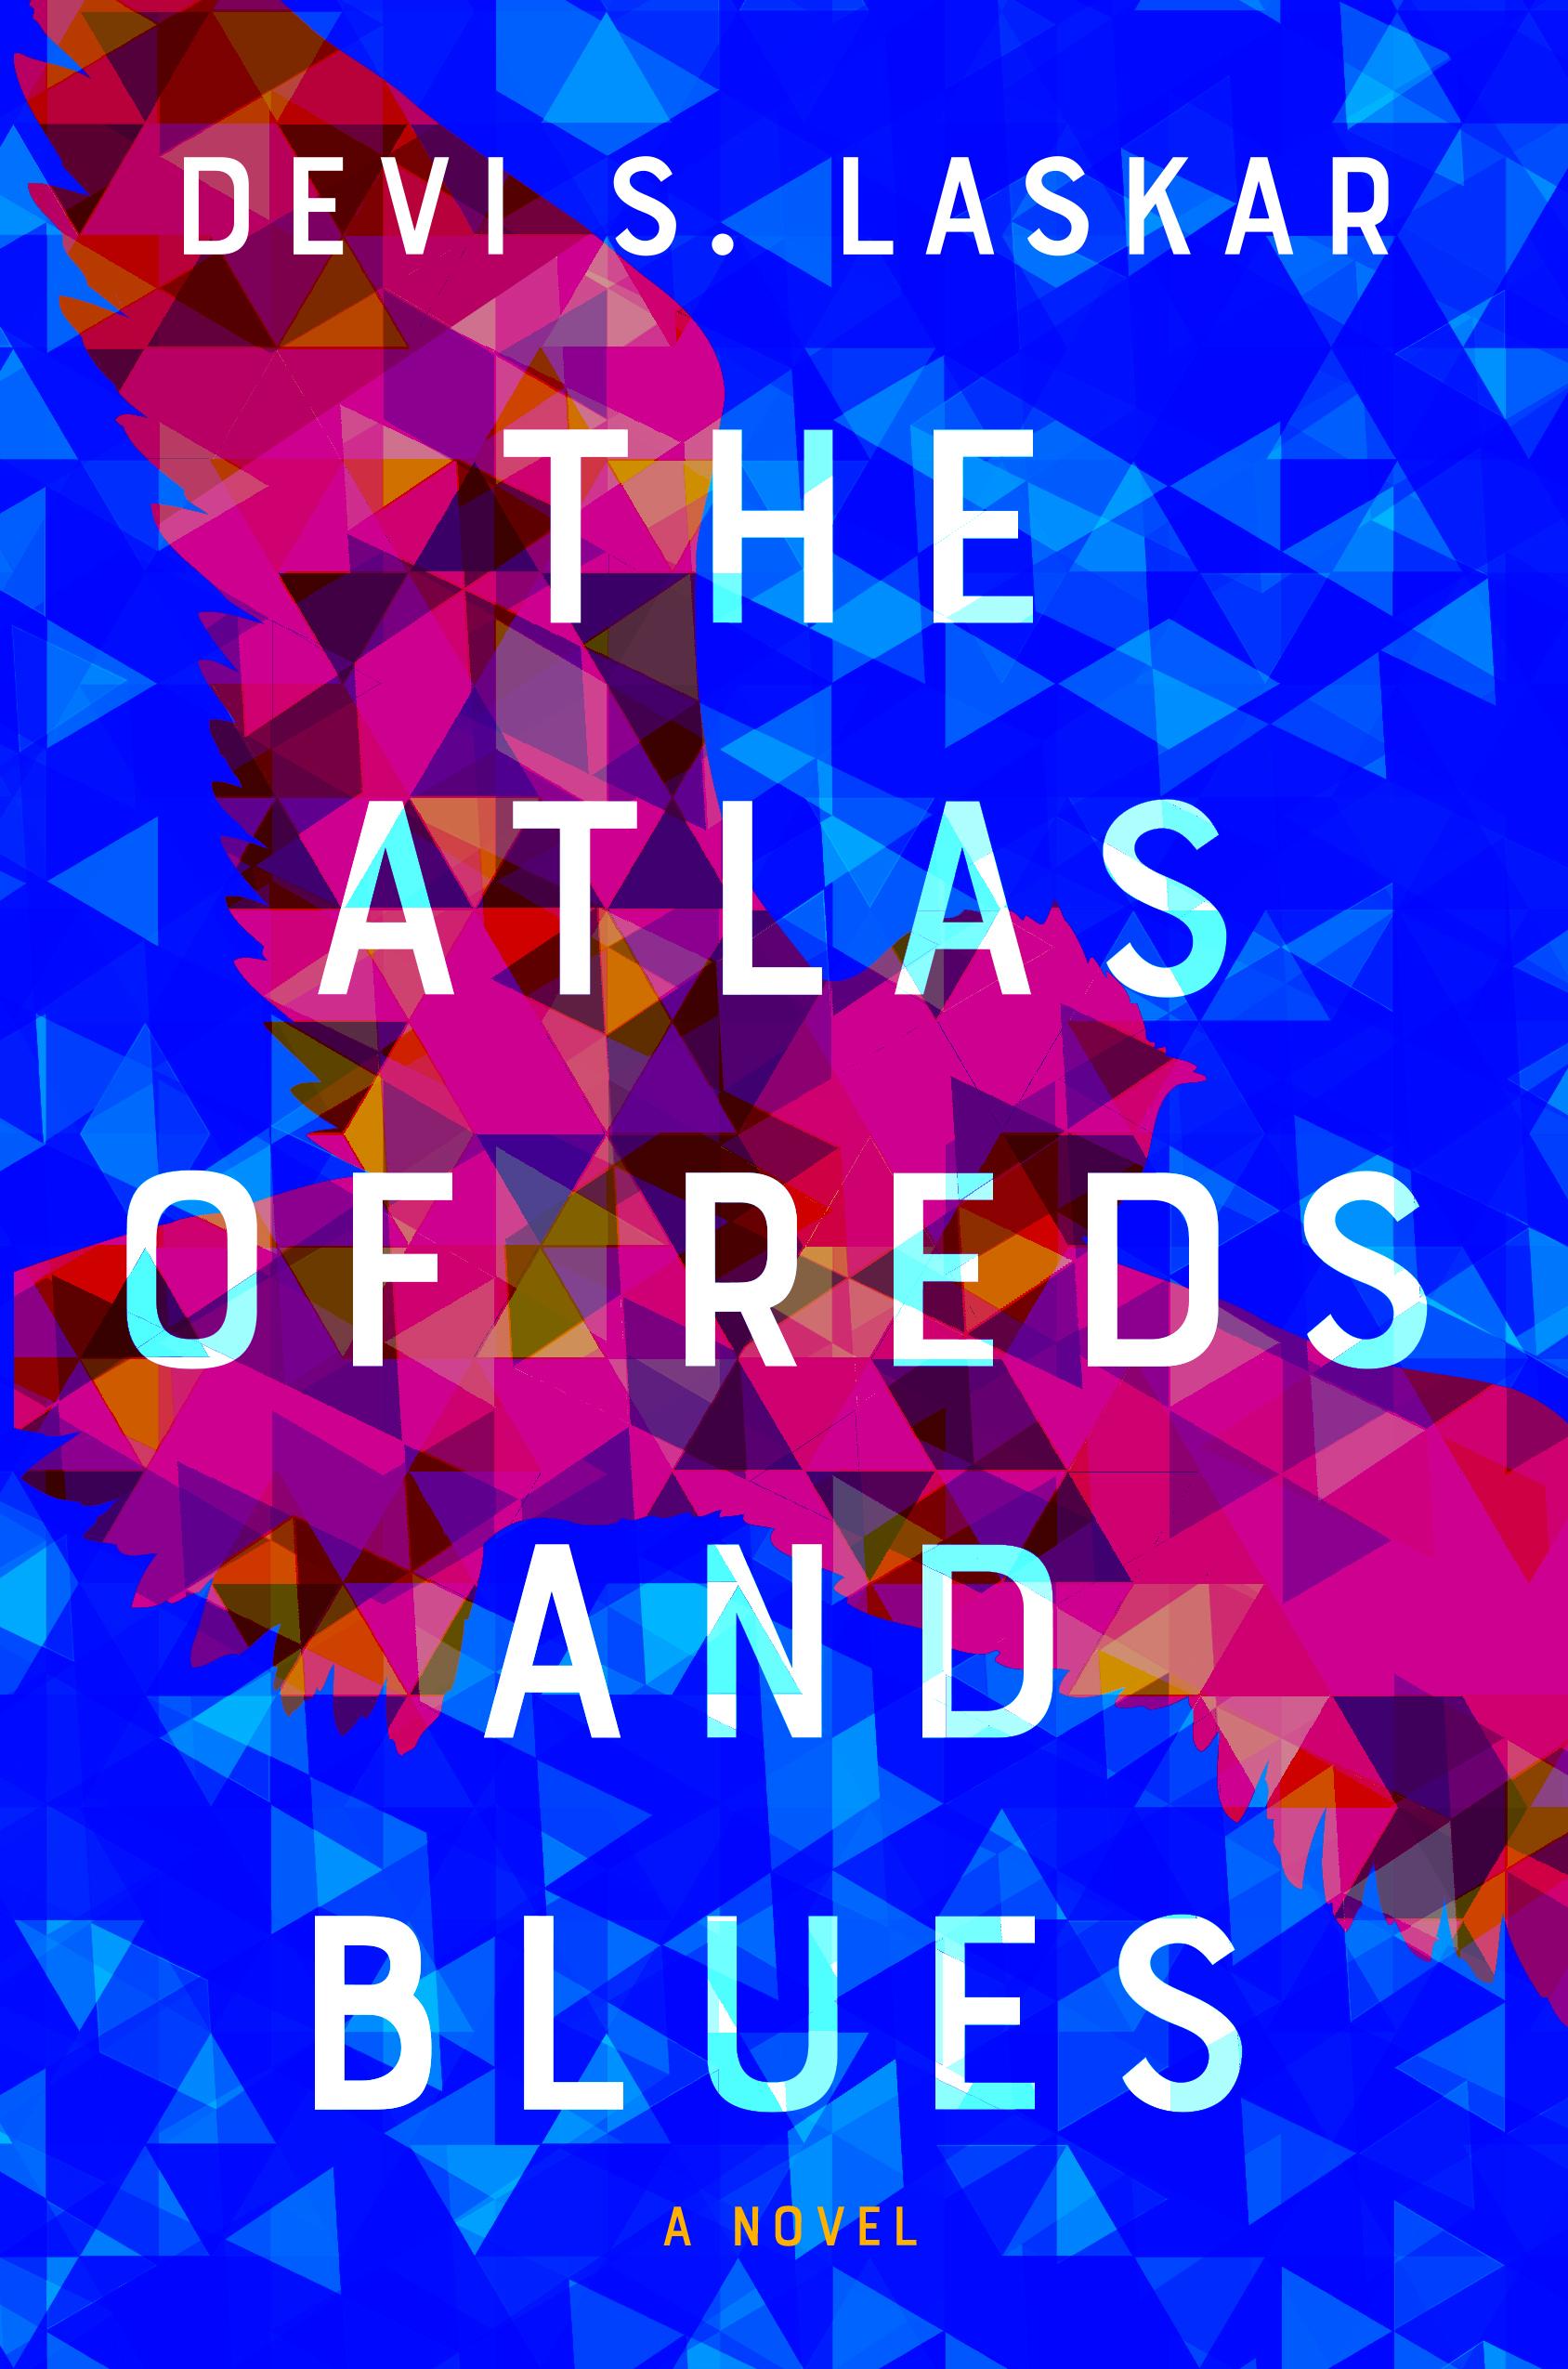 The Atlas of Reds and Blues_cvr_300dpi print res (1).jpg